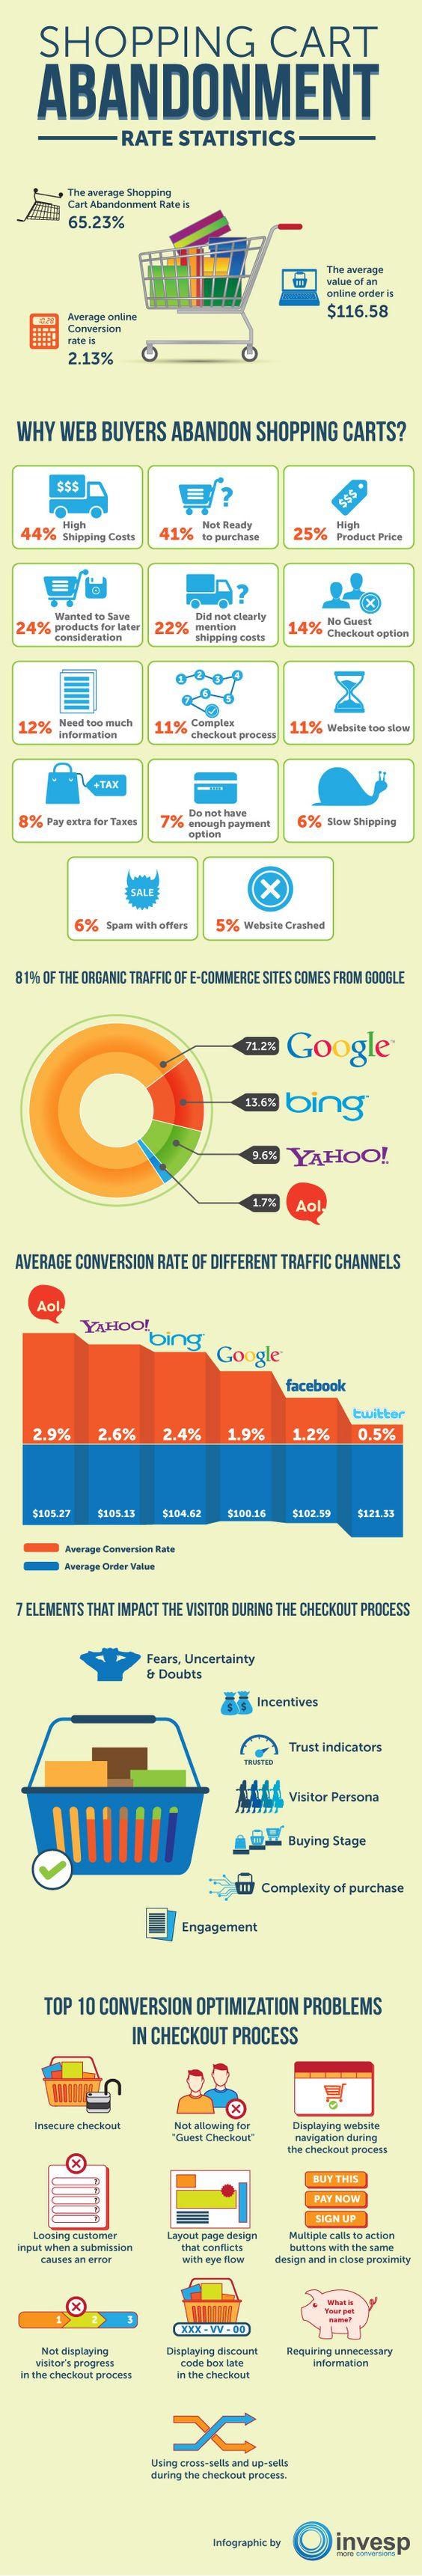 Reasons people abandon ecommerce shopping carts #infographic